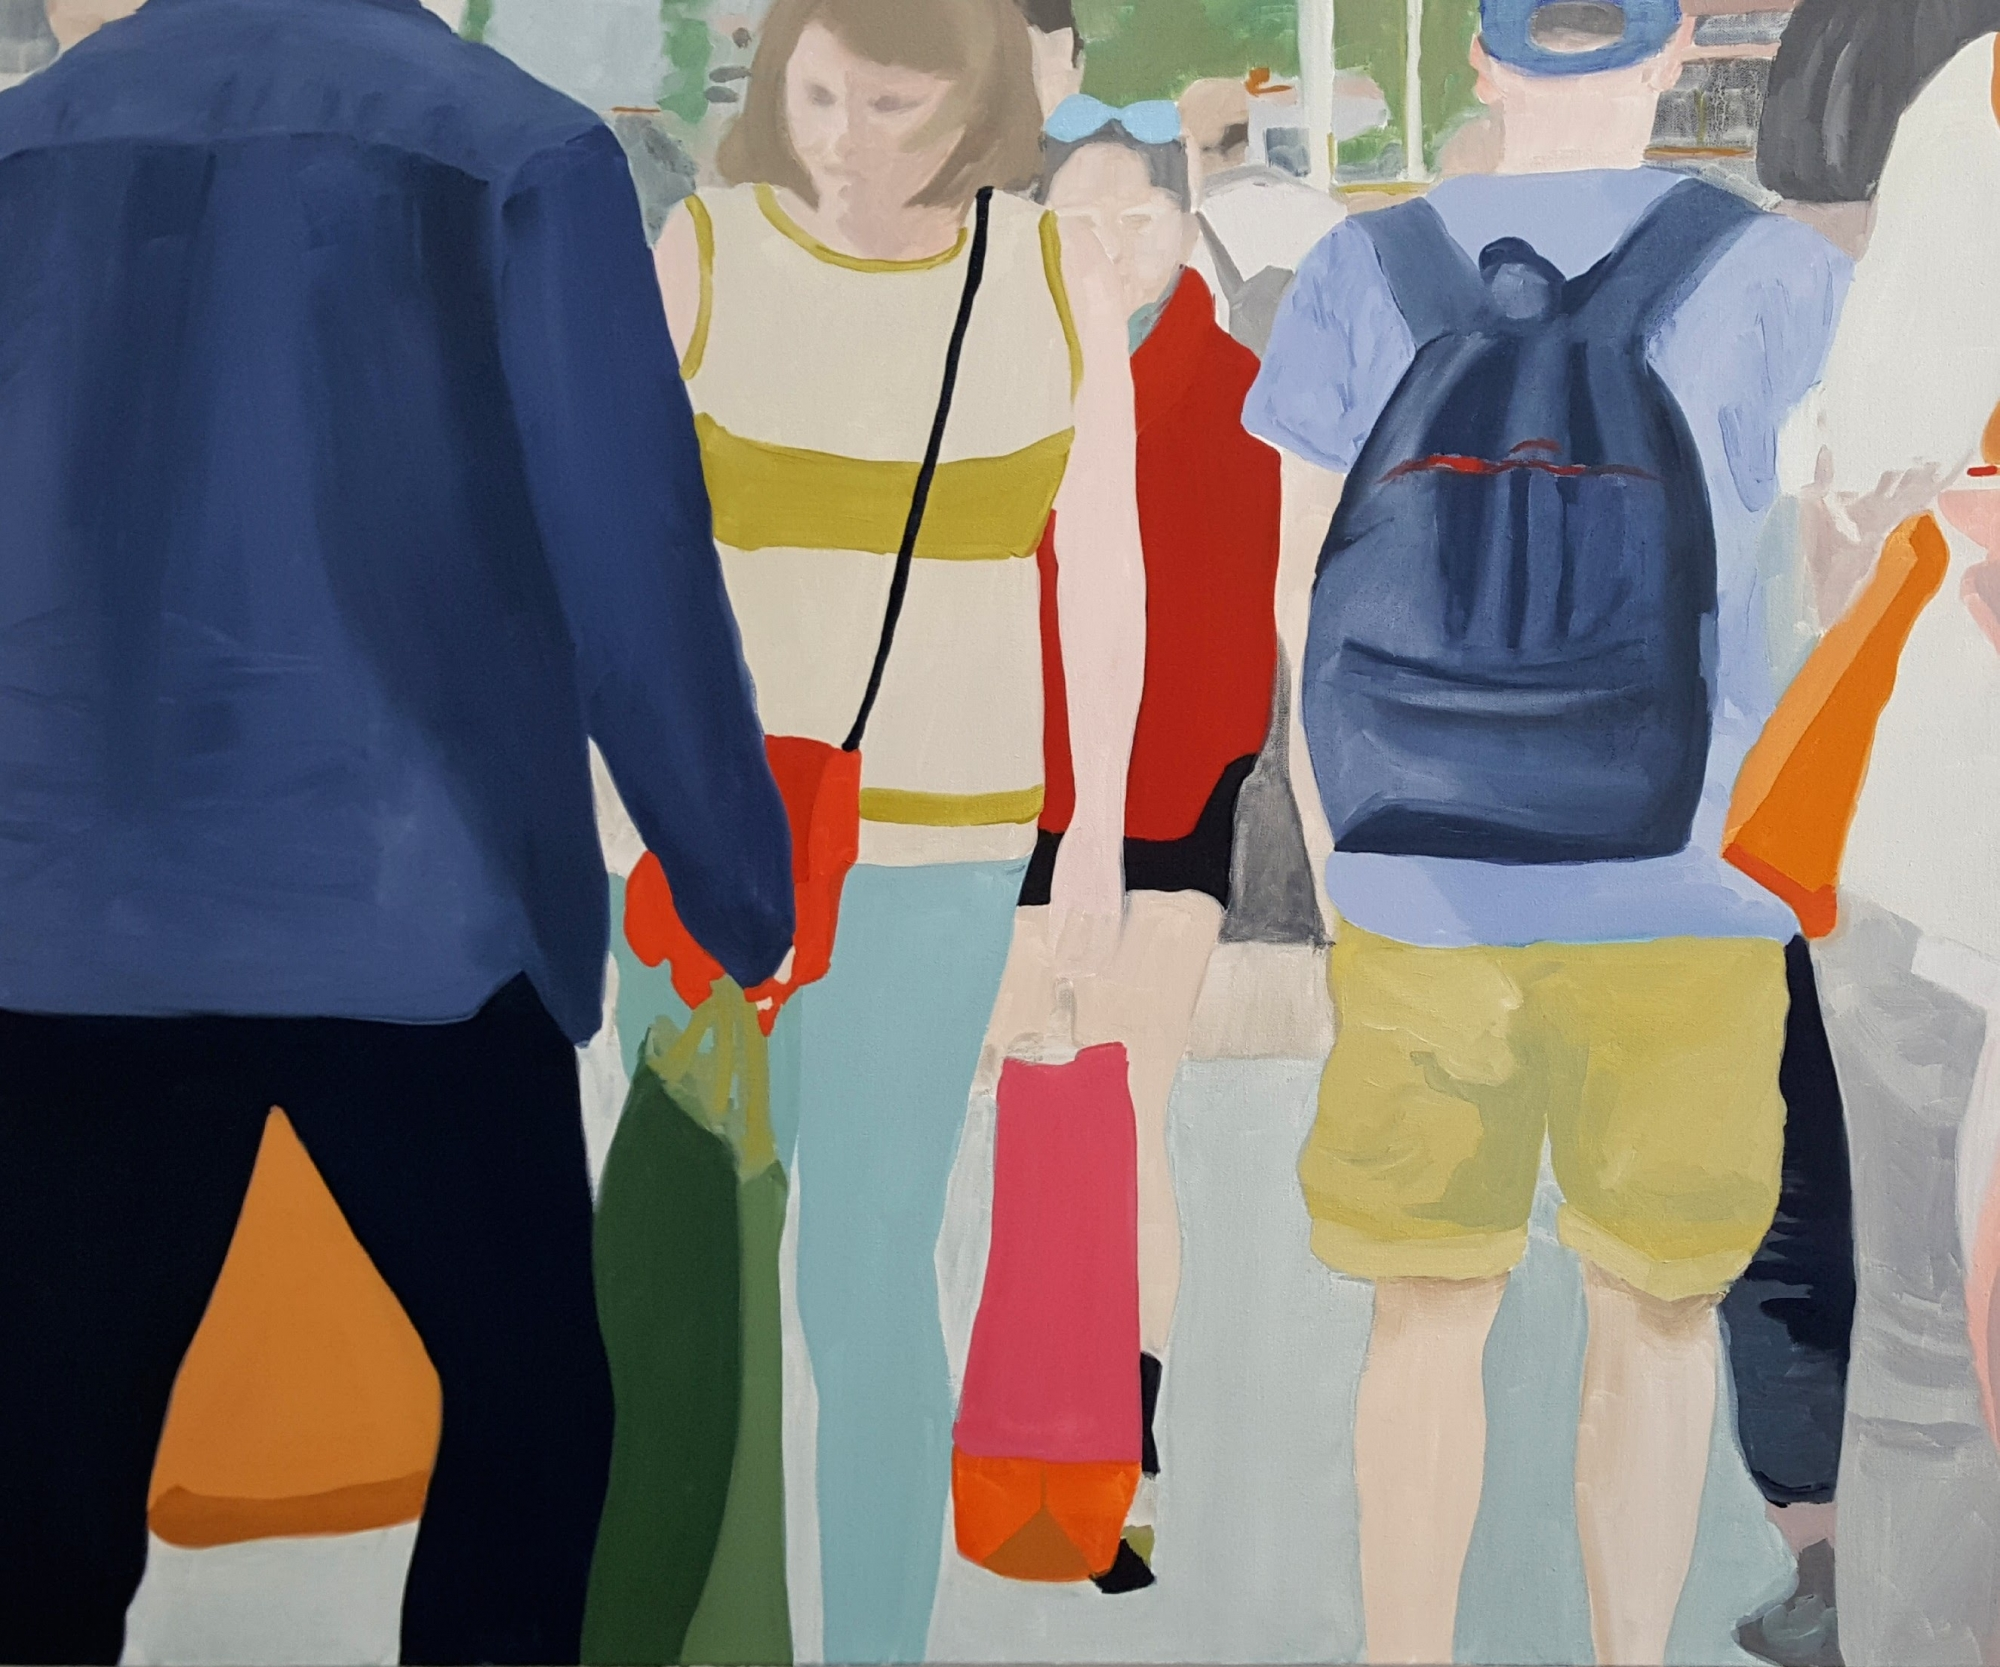 Bystanders 2 by Sherry  Czekus